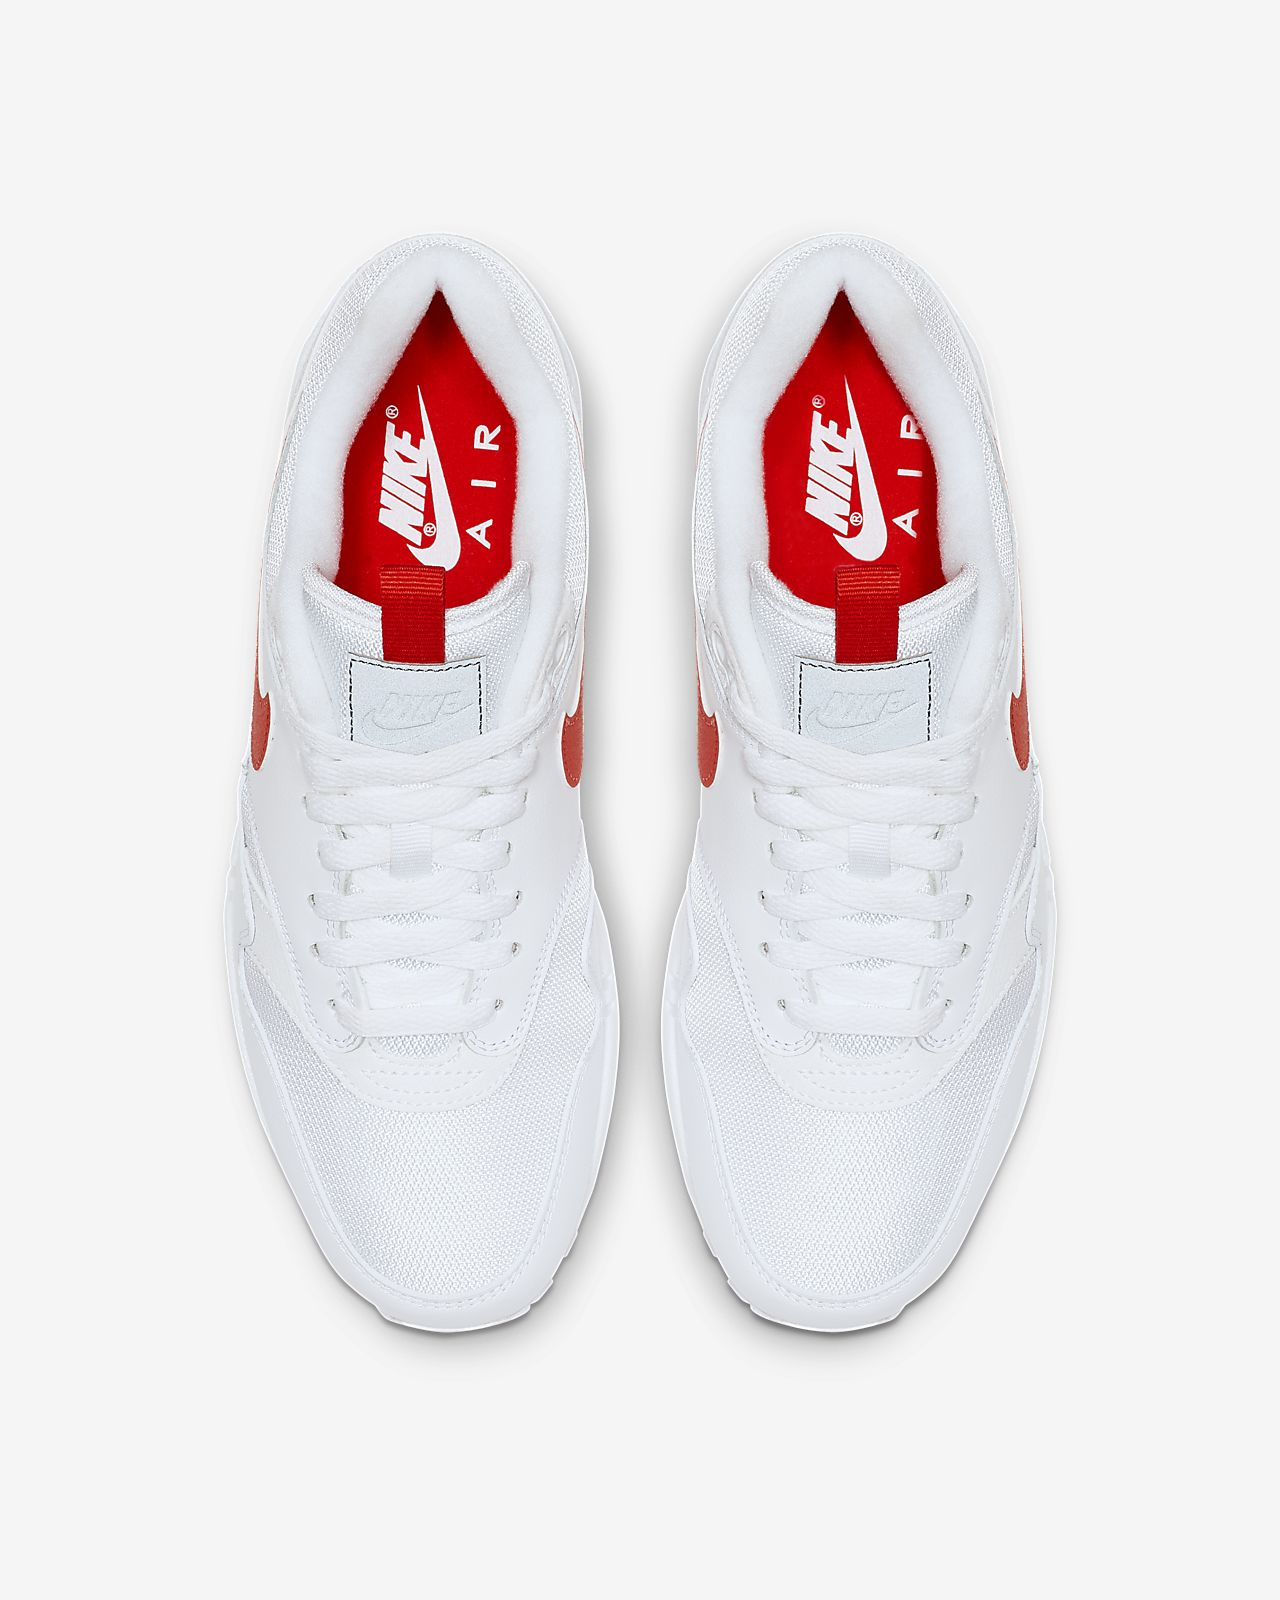 sale retailer bf47d 61337 ... Nike Air Max 1 SE Men s Shoe